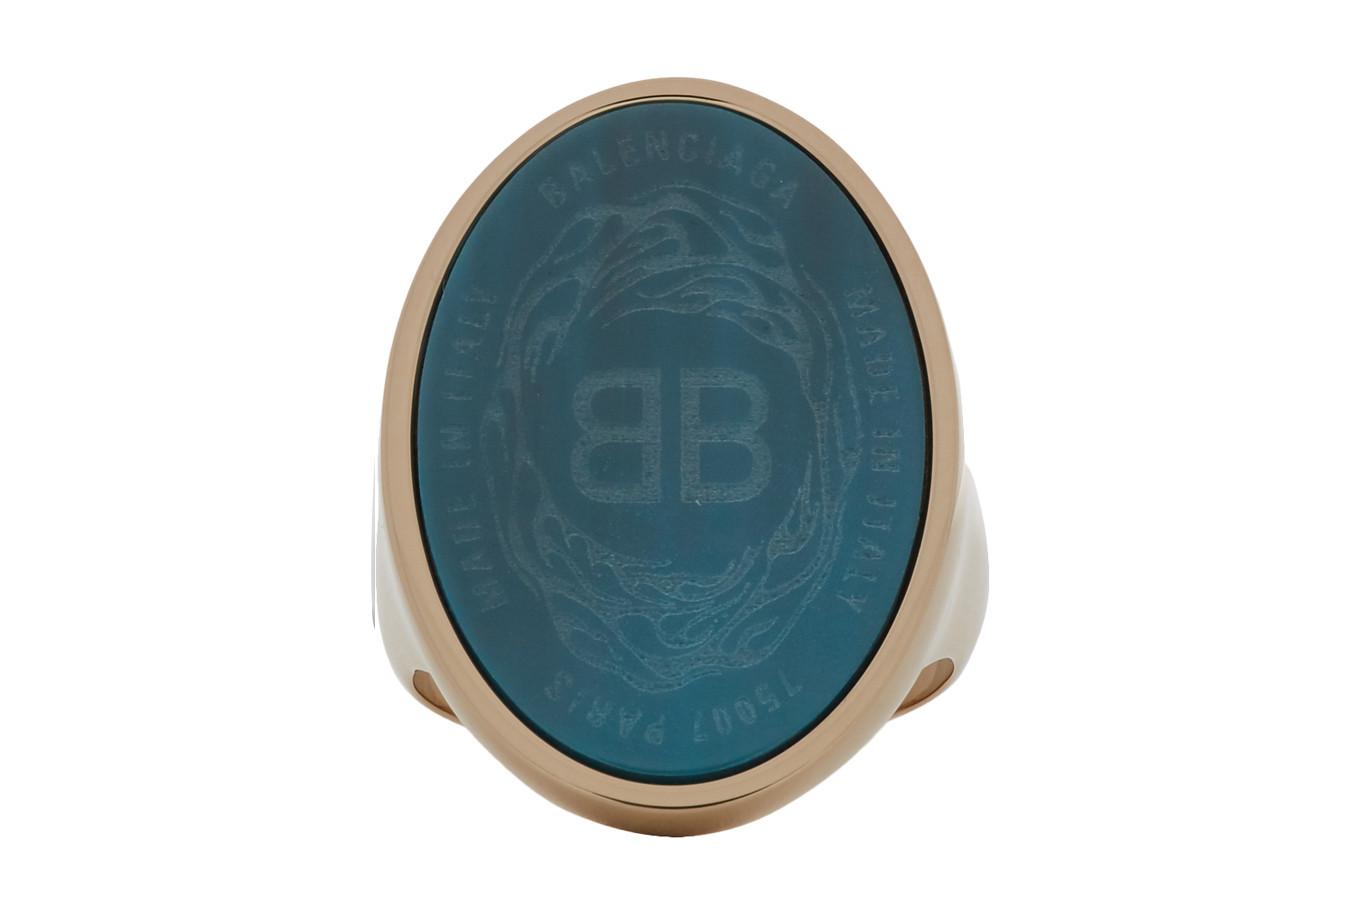 https___hypebeast.com_image_2018_12_balenciaga-chevaliere-signet-ring-03.jpg